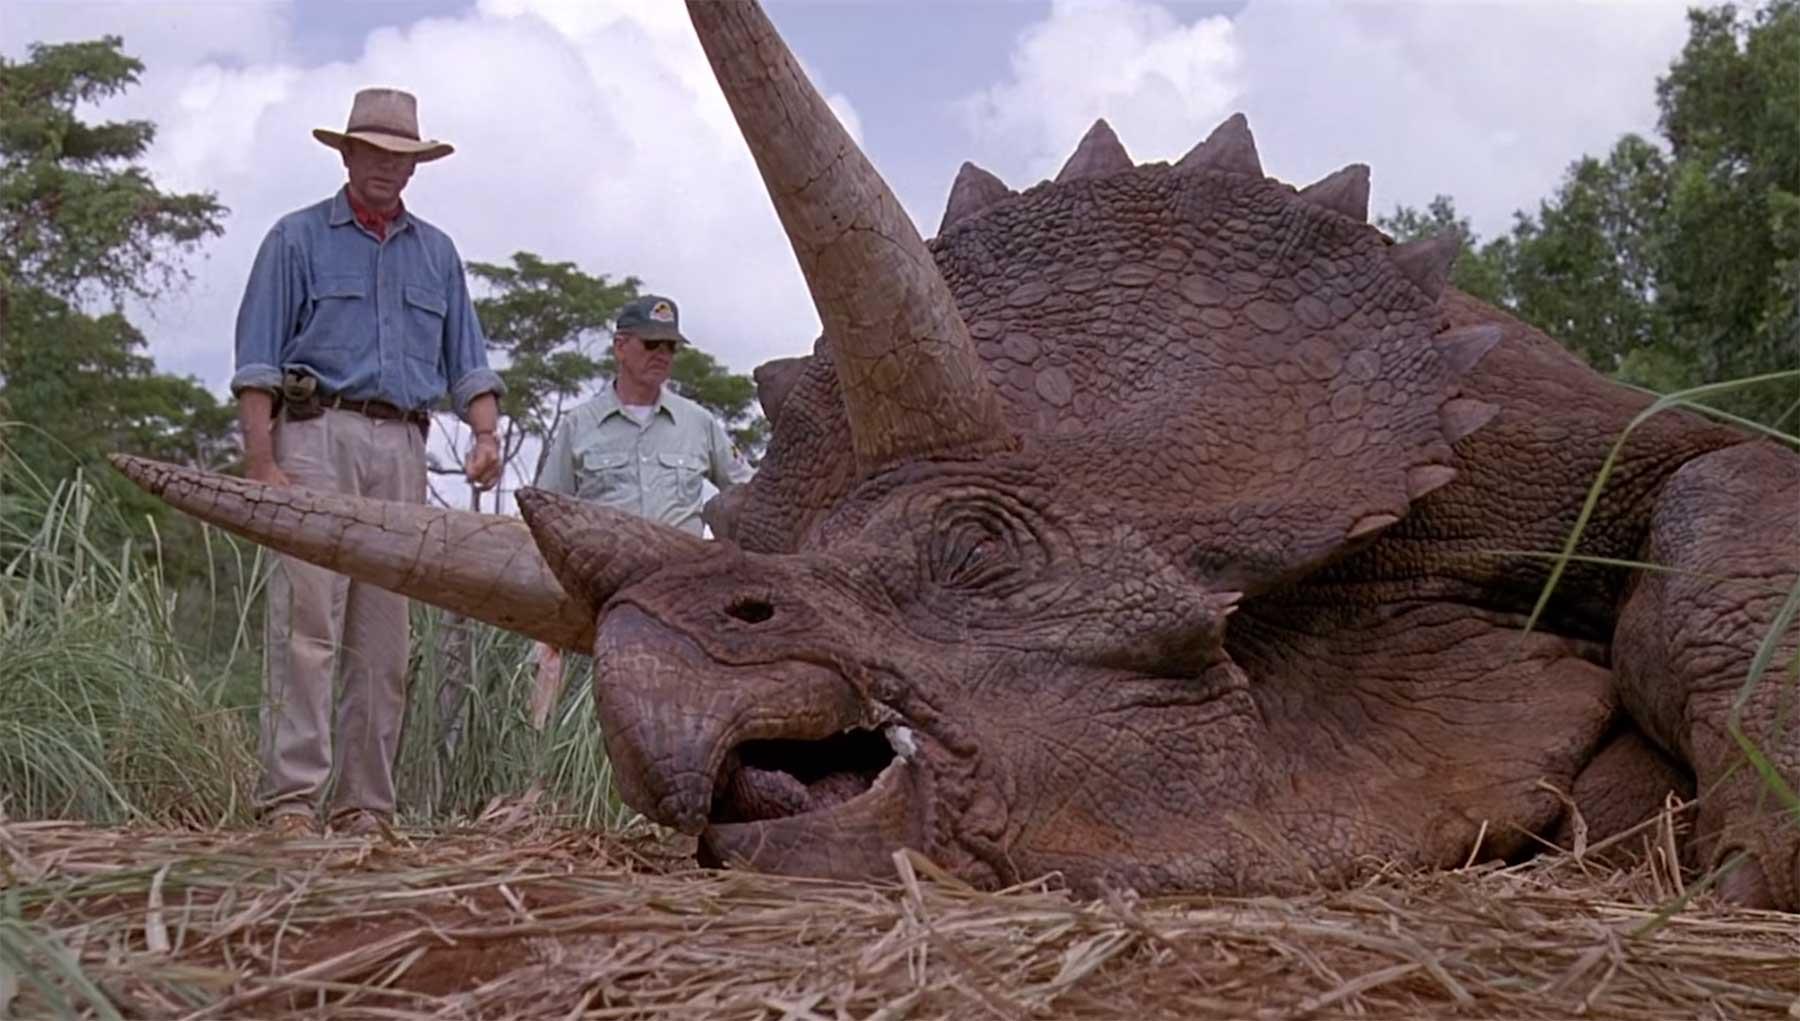 Experte erklärt alle Jurassic Park-Dinosaurier